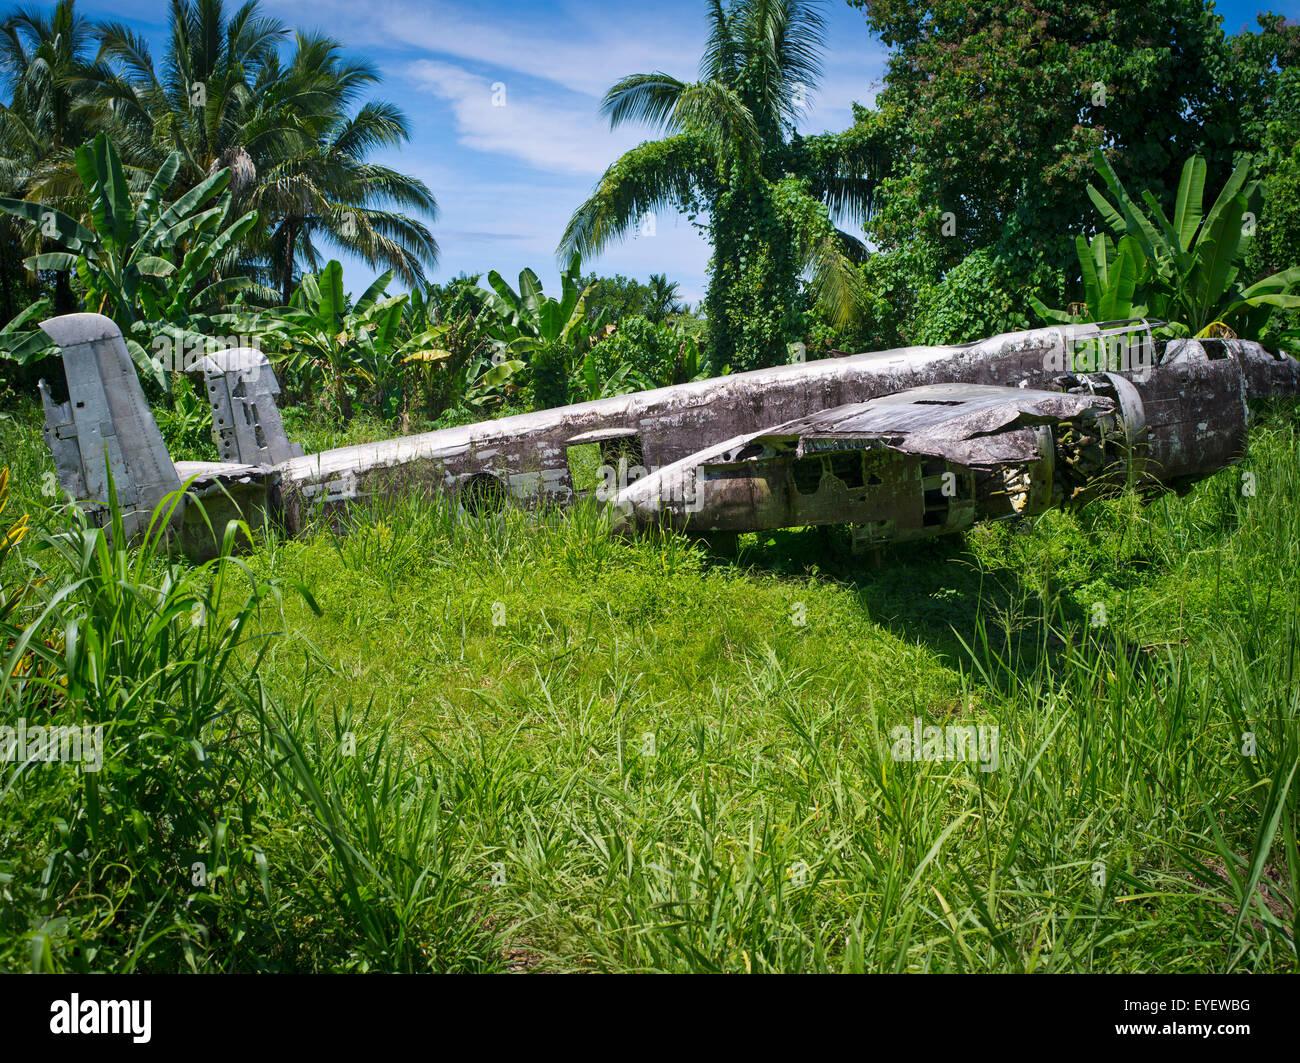 Second World War Plane Crash Stock Photos & Second World War Plane